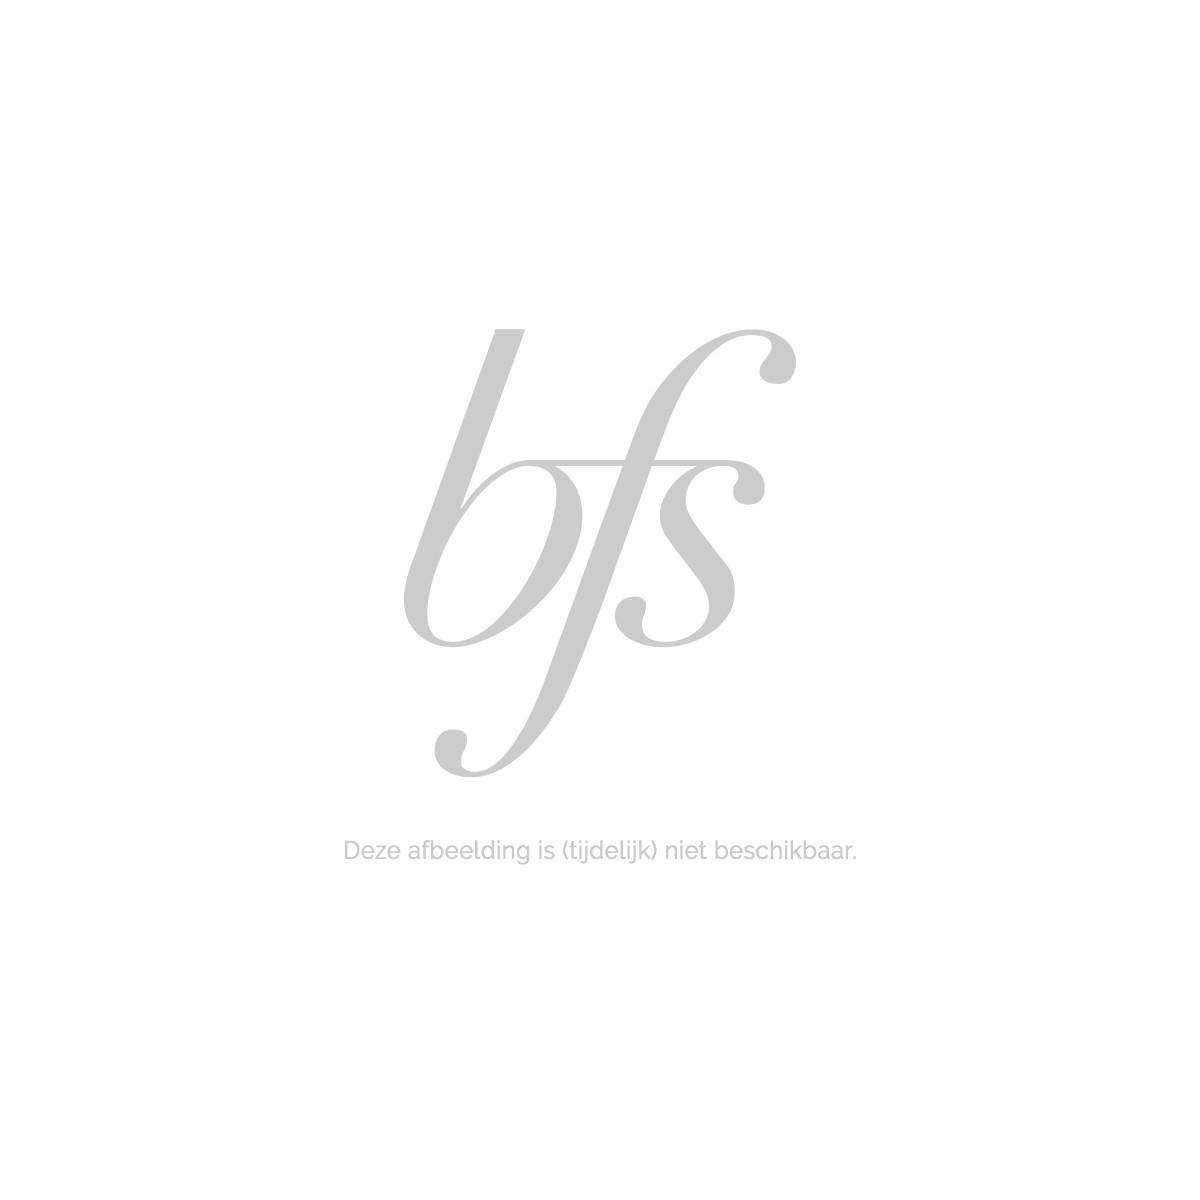 Hildegard Braukmann Sun and Care Aloe Vera Gesichtscreme Spf 50